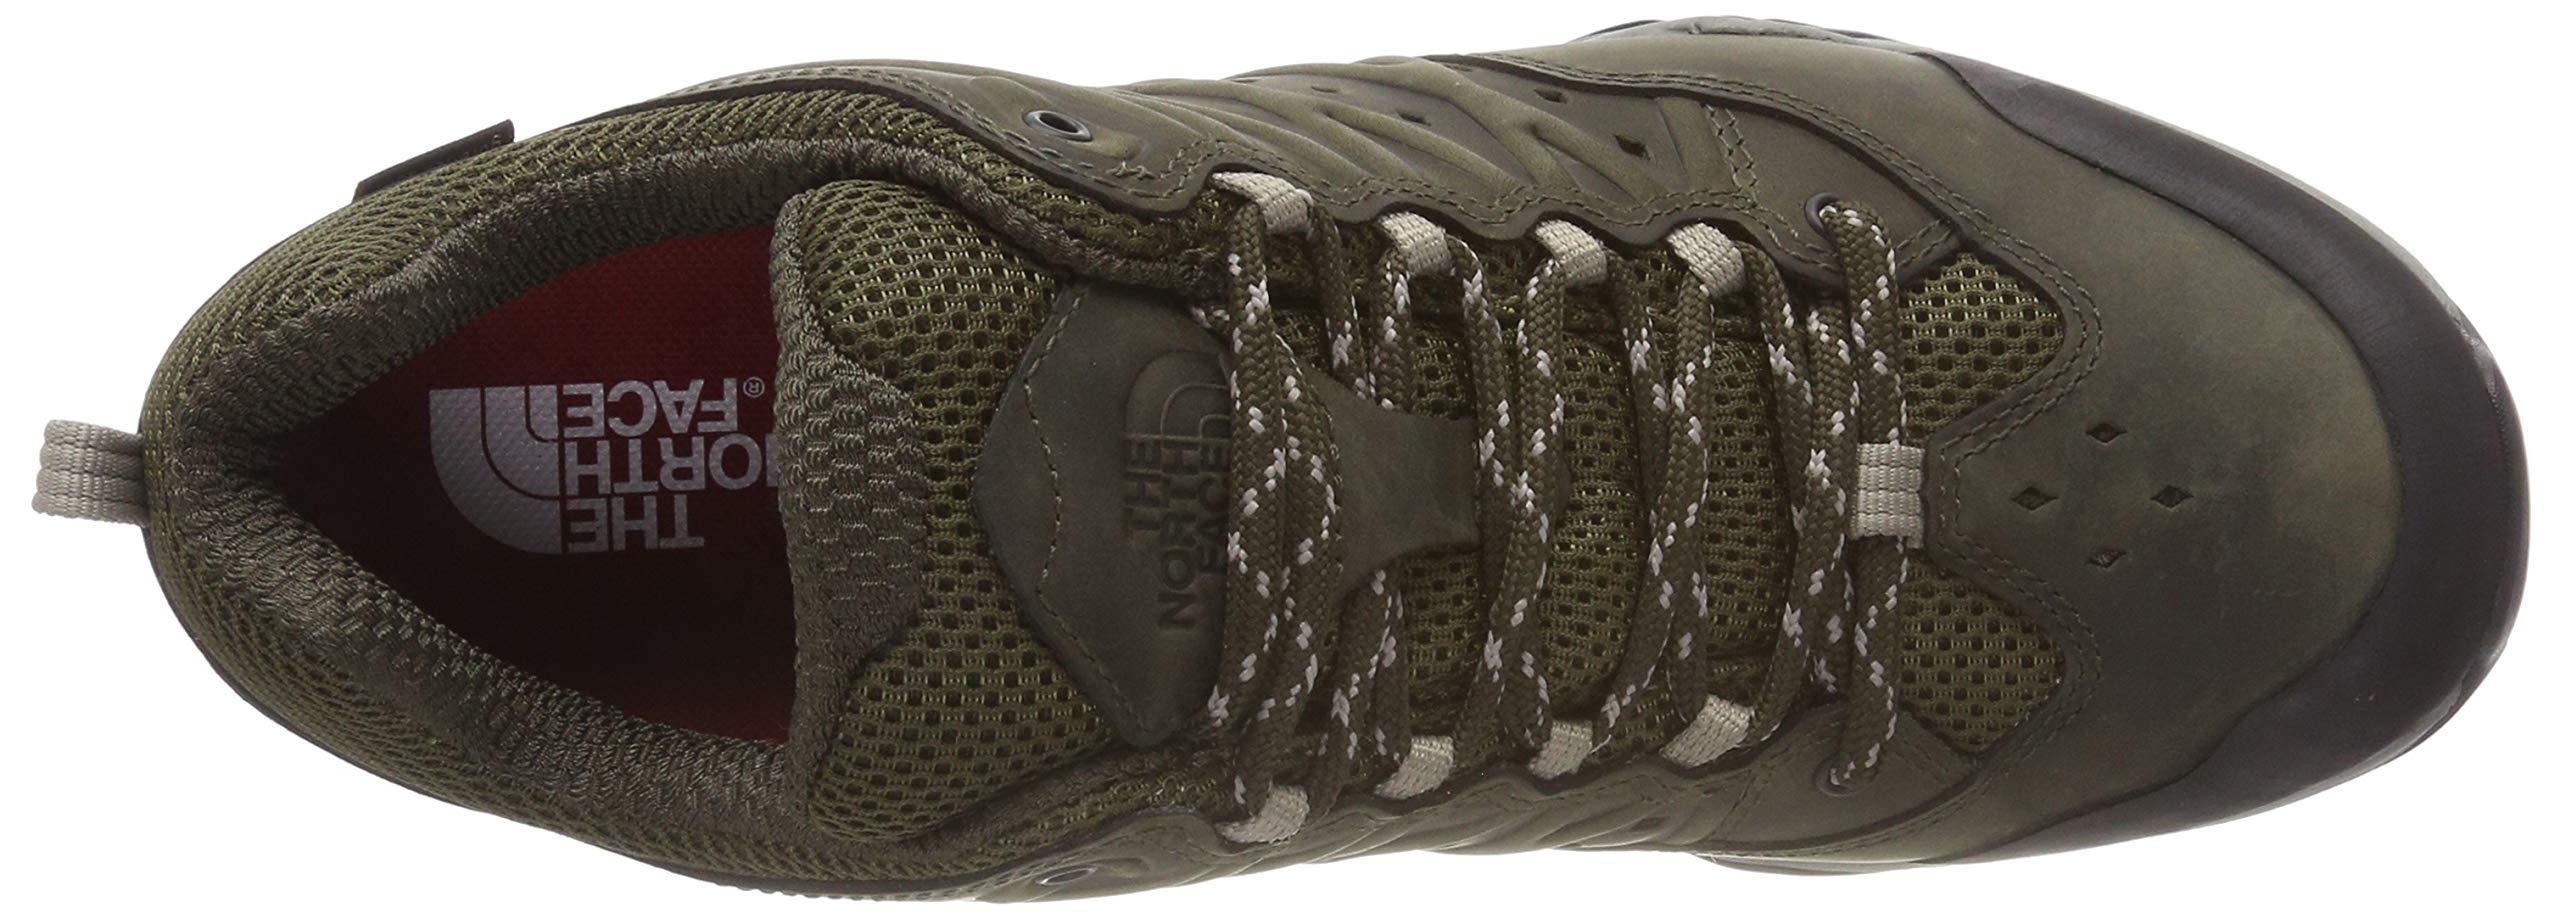 71PHegTb0QL - THE NORTH FACE Men's Hedgehog Ii GTX Low Rise Hiking Boots